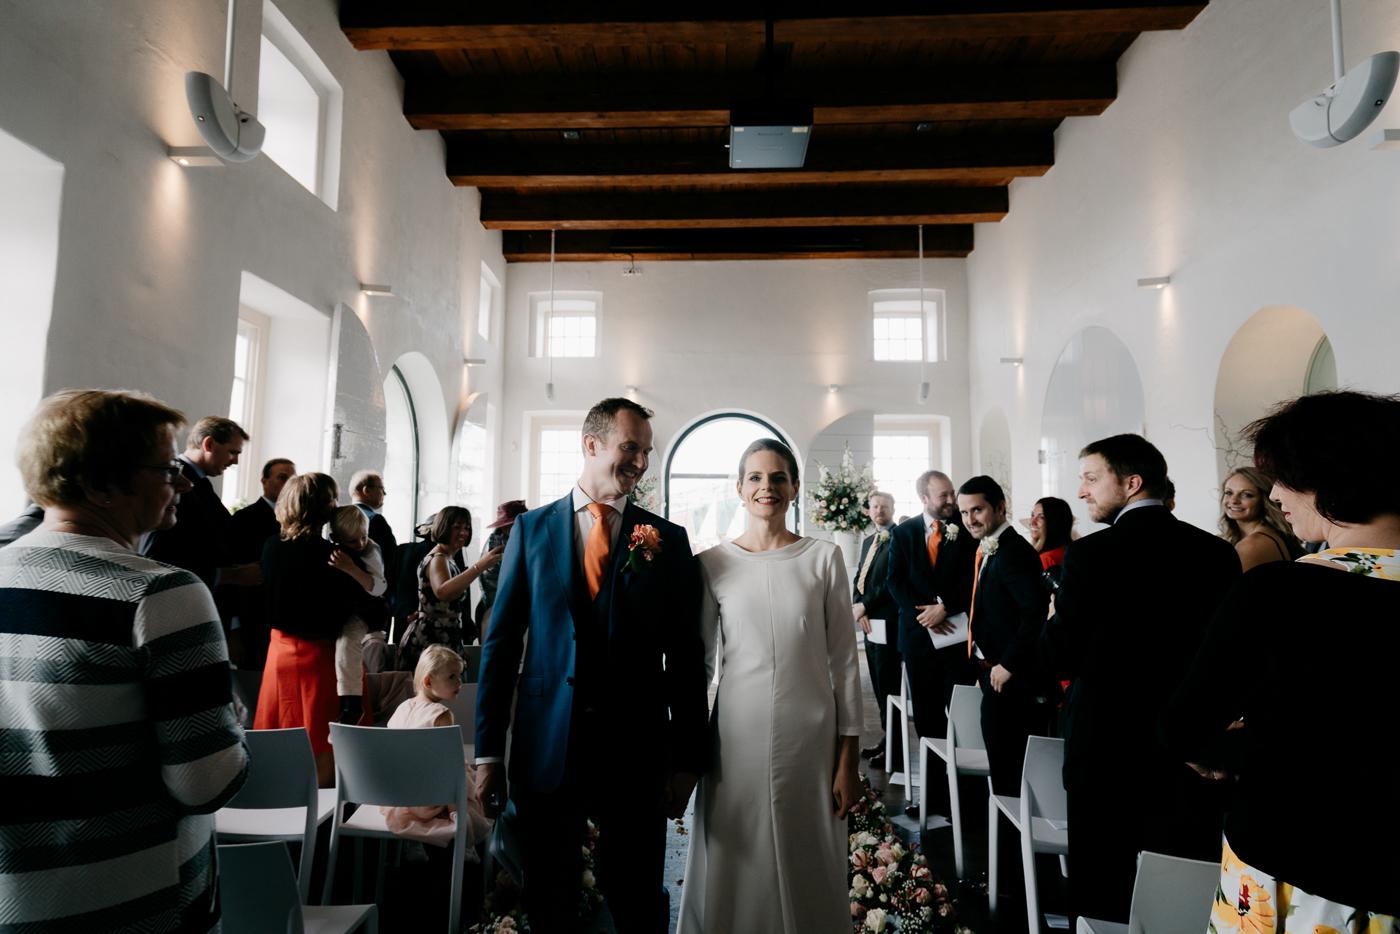 bruidsfotografie-trouwfotograaf-wedding-photographer-amsterdam-James-Jantine-194.jpg